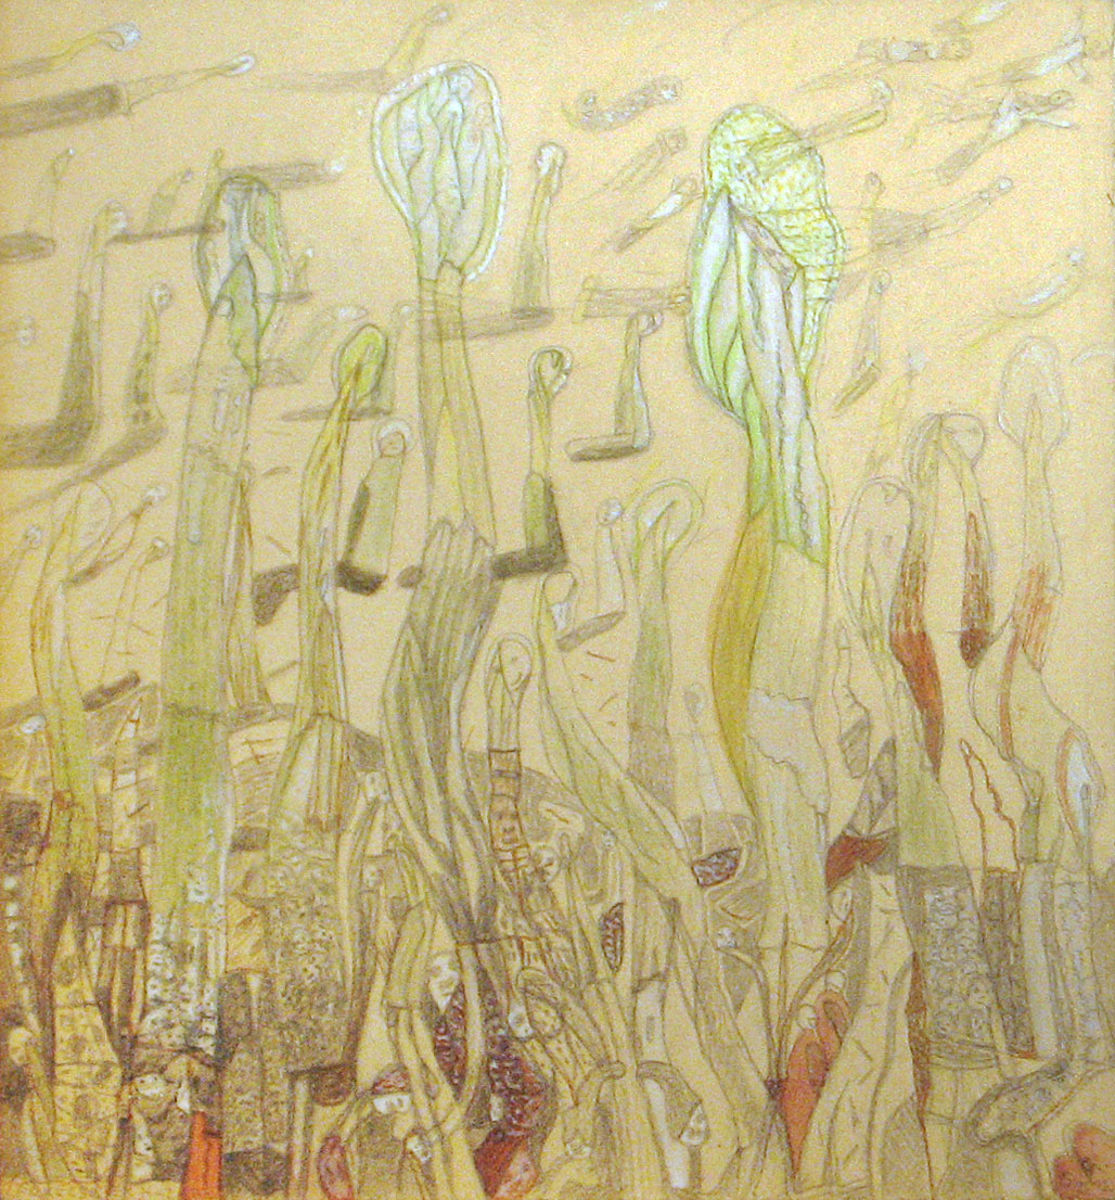 Lelkecskék hazafelé - p. karton, ceruza, temp. 37,5x34 cm (2012)